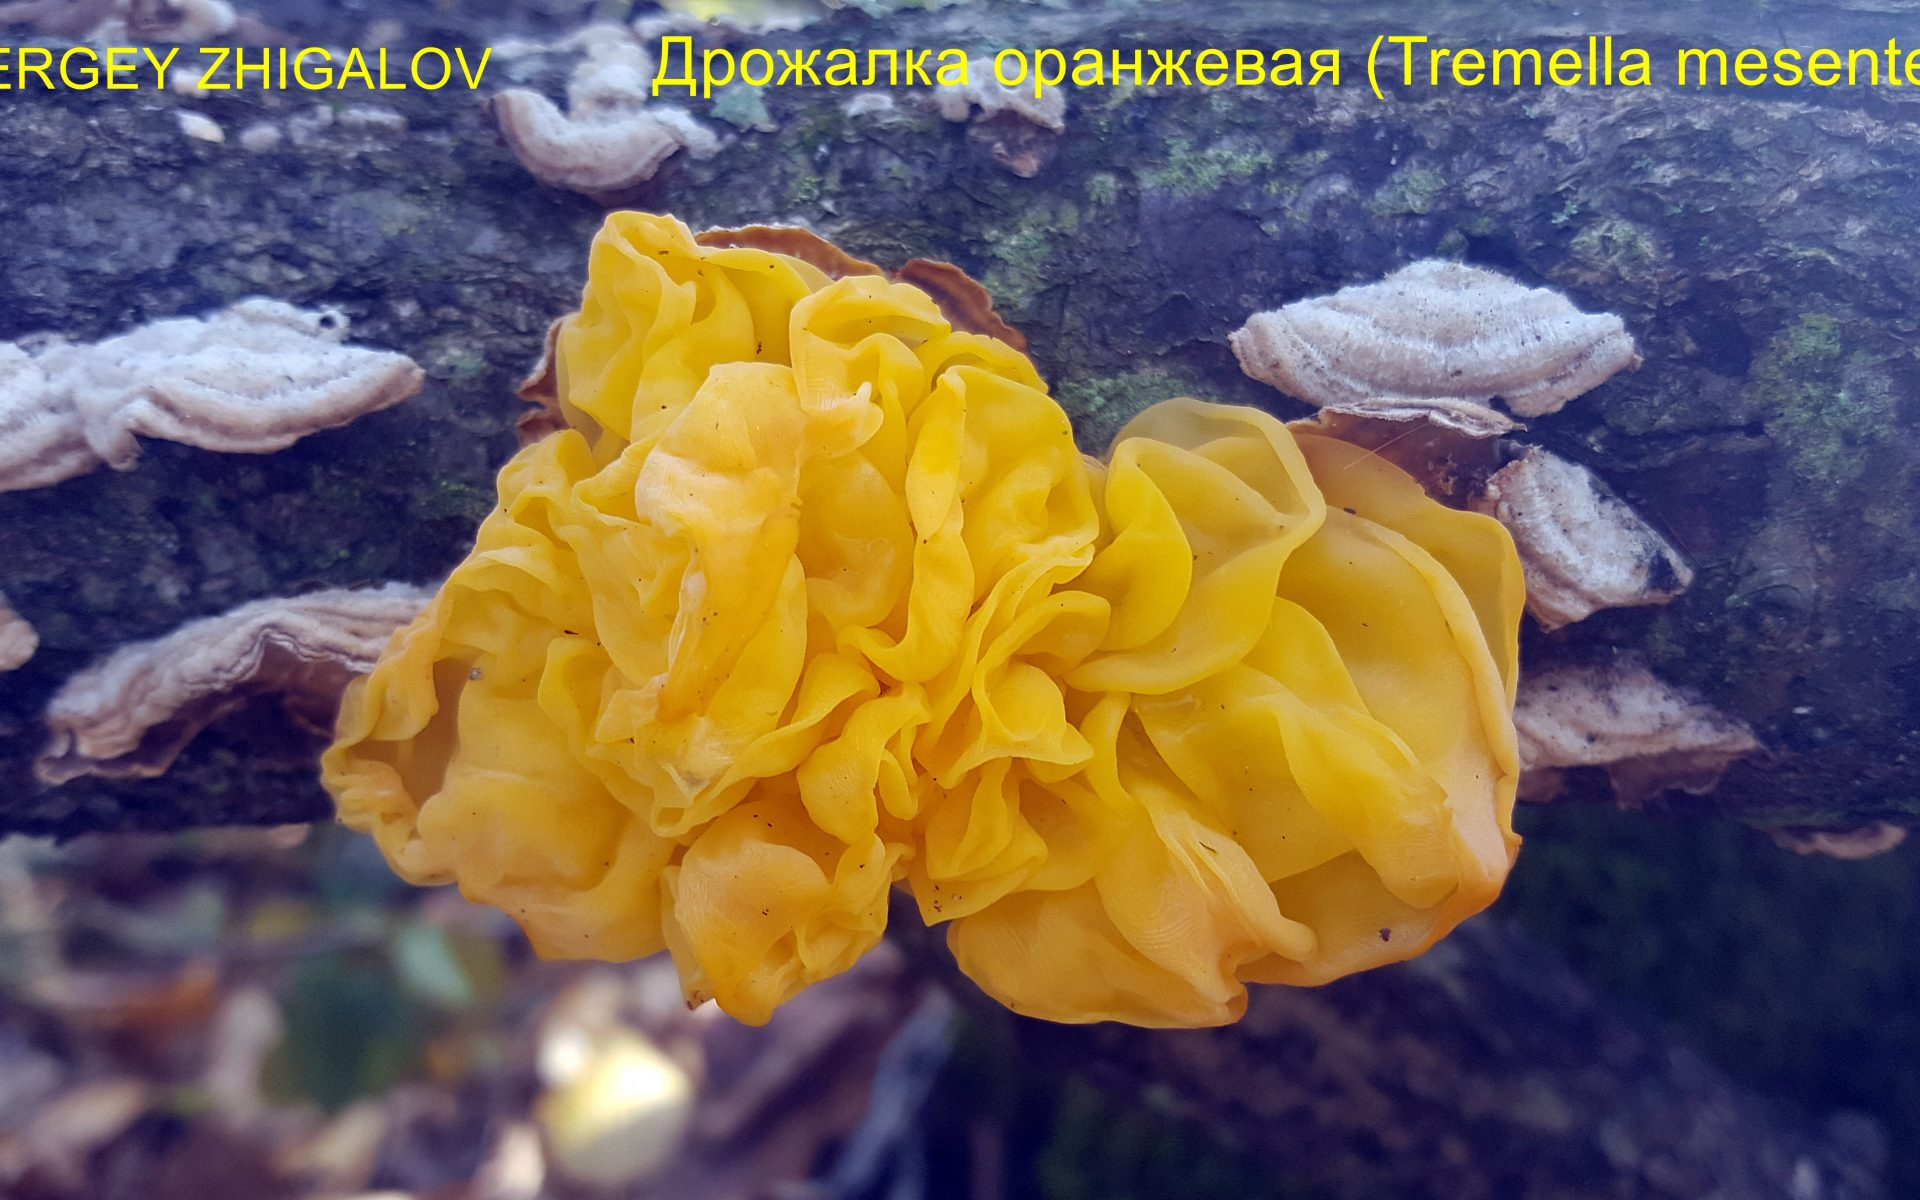 Дрожалка оранжевая Tremella mesenterica